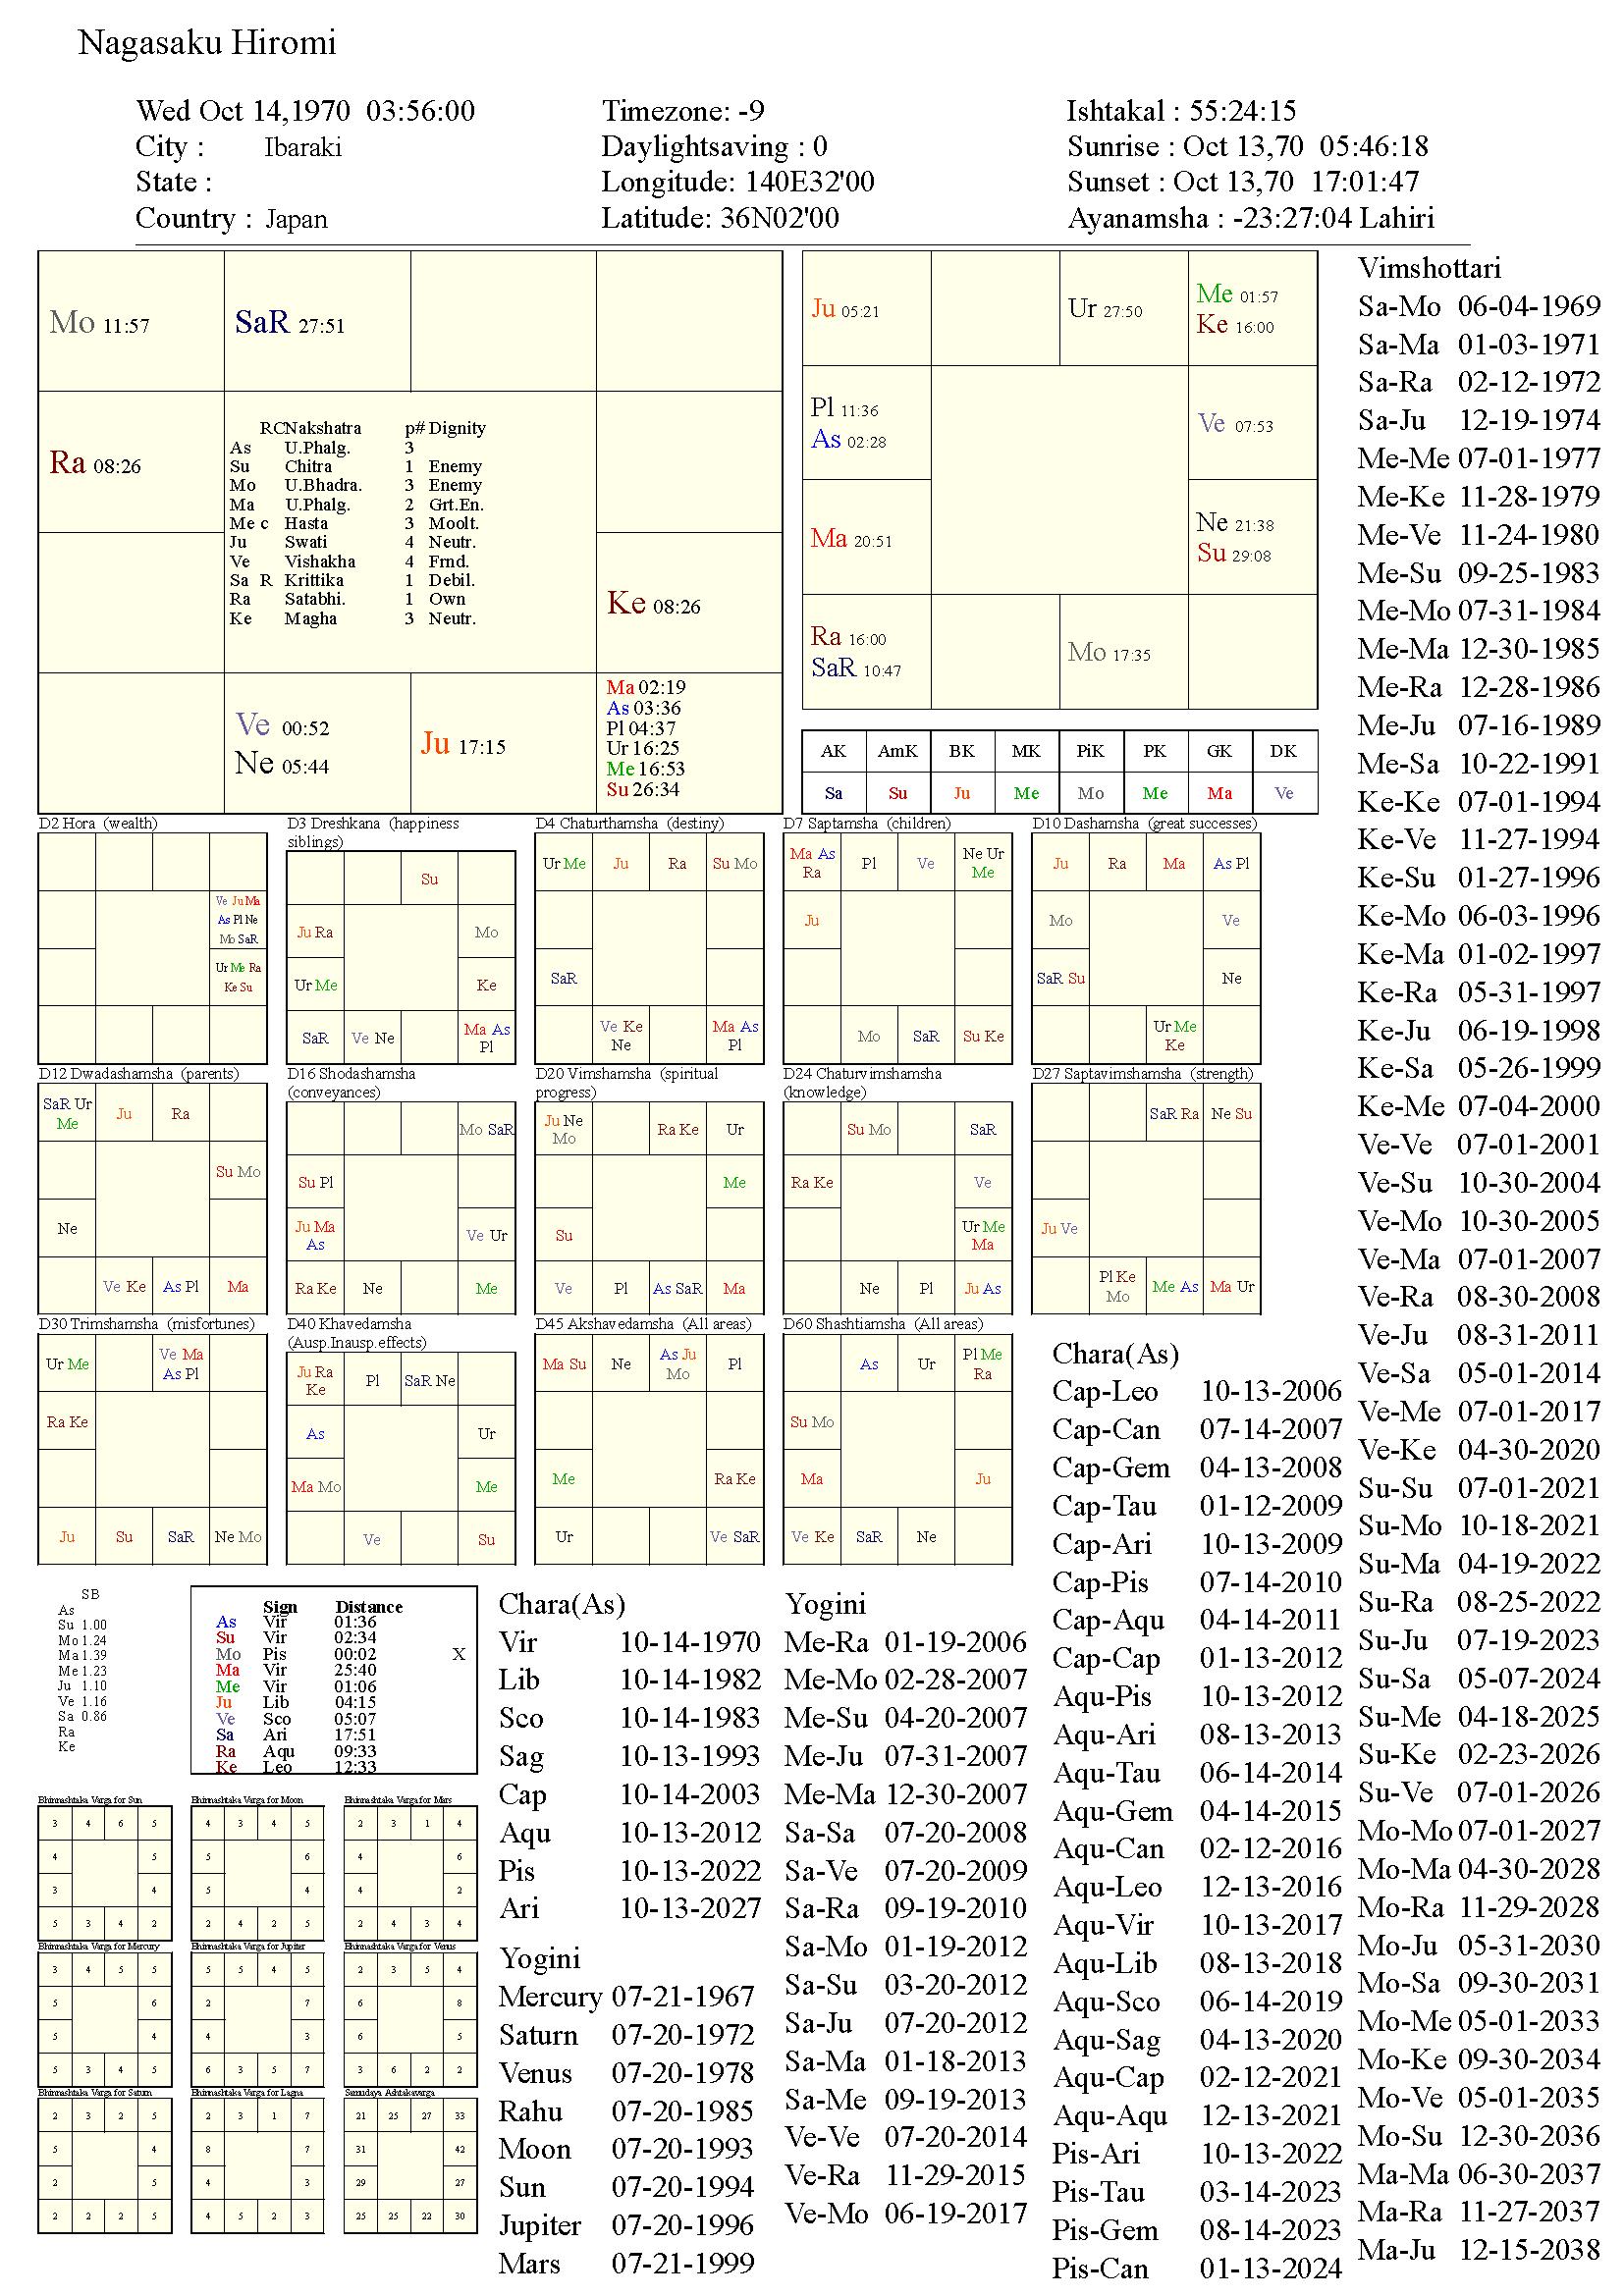 nagasakuhiromi_chart